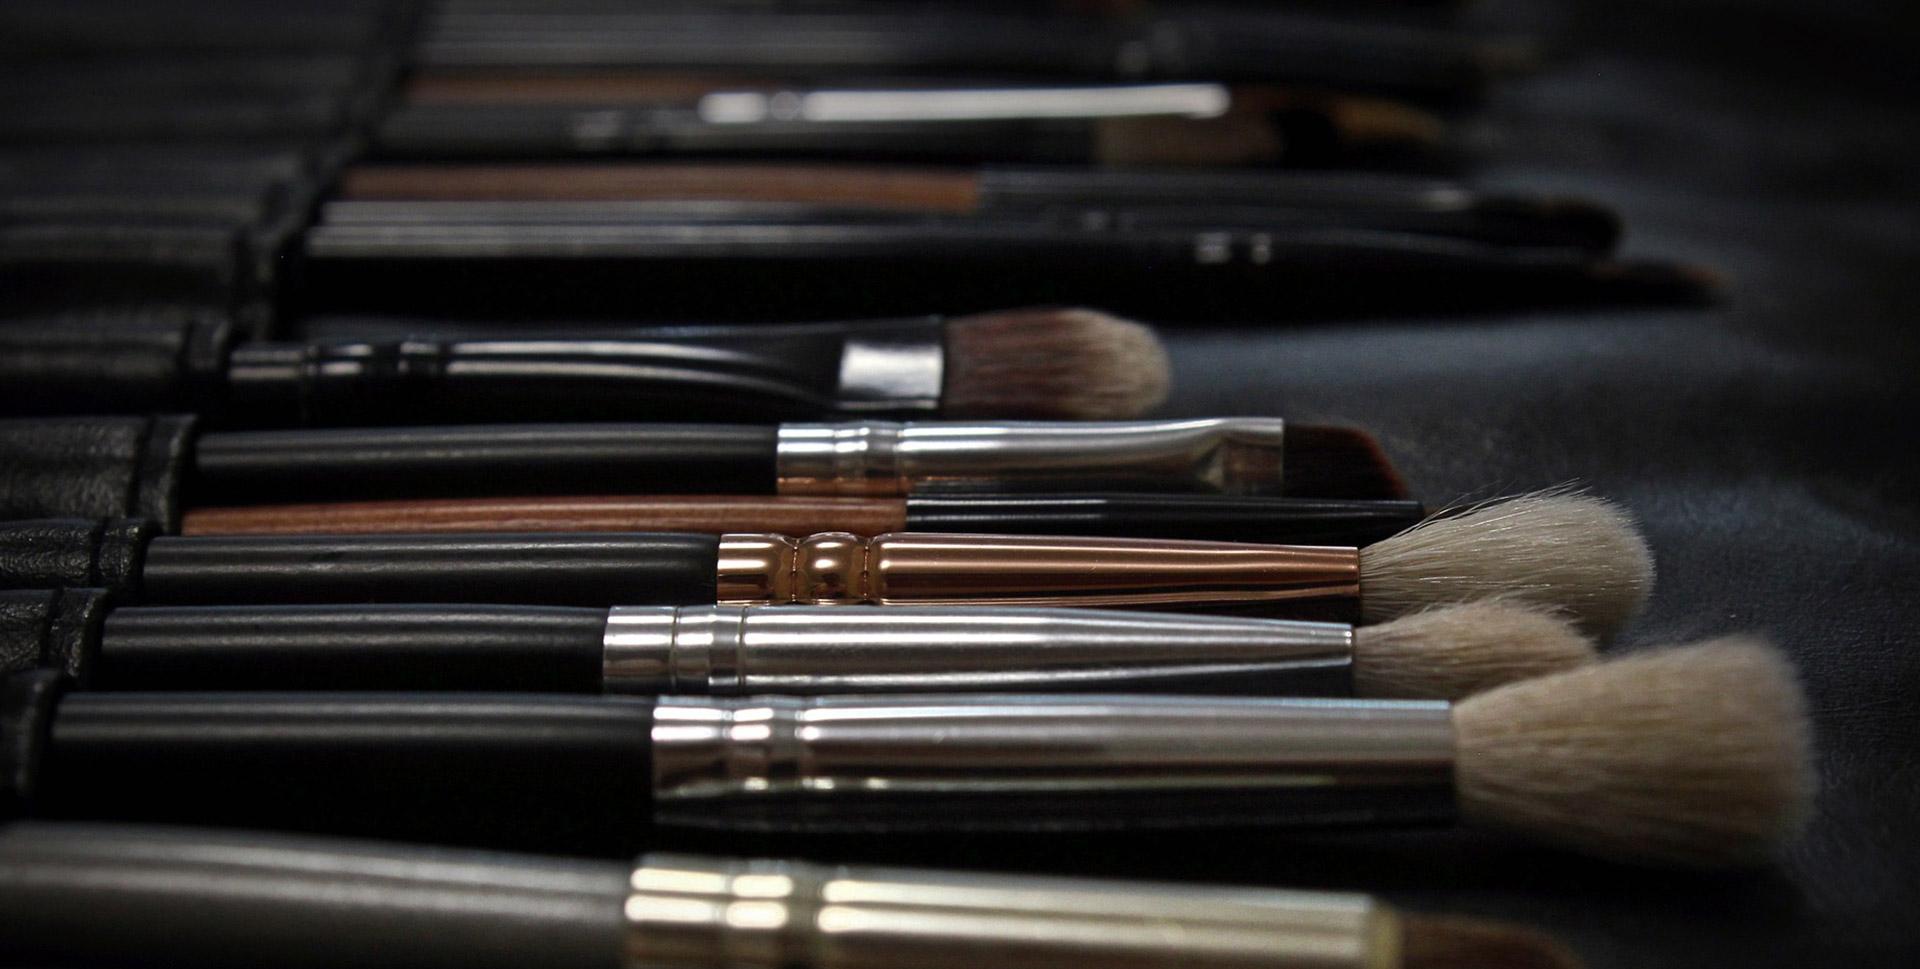 manu camargo 60128 unsplash5 - Home - Australian PMU Supplies | Cosmetic tattoo supplies | PMU equipment australia | cosmetic tattooing machine in australia